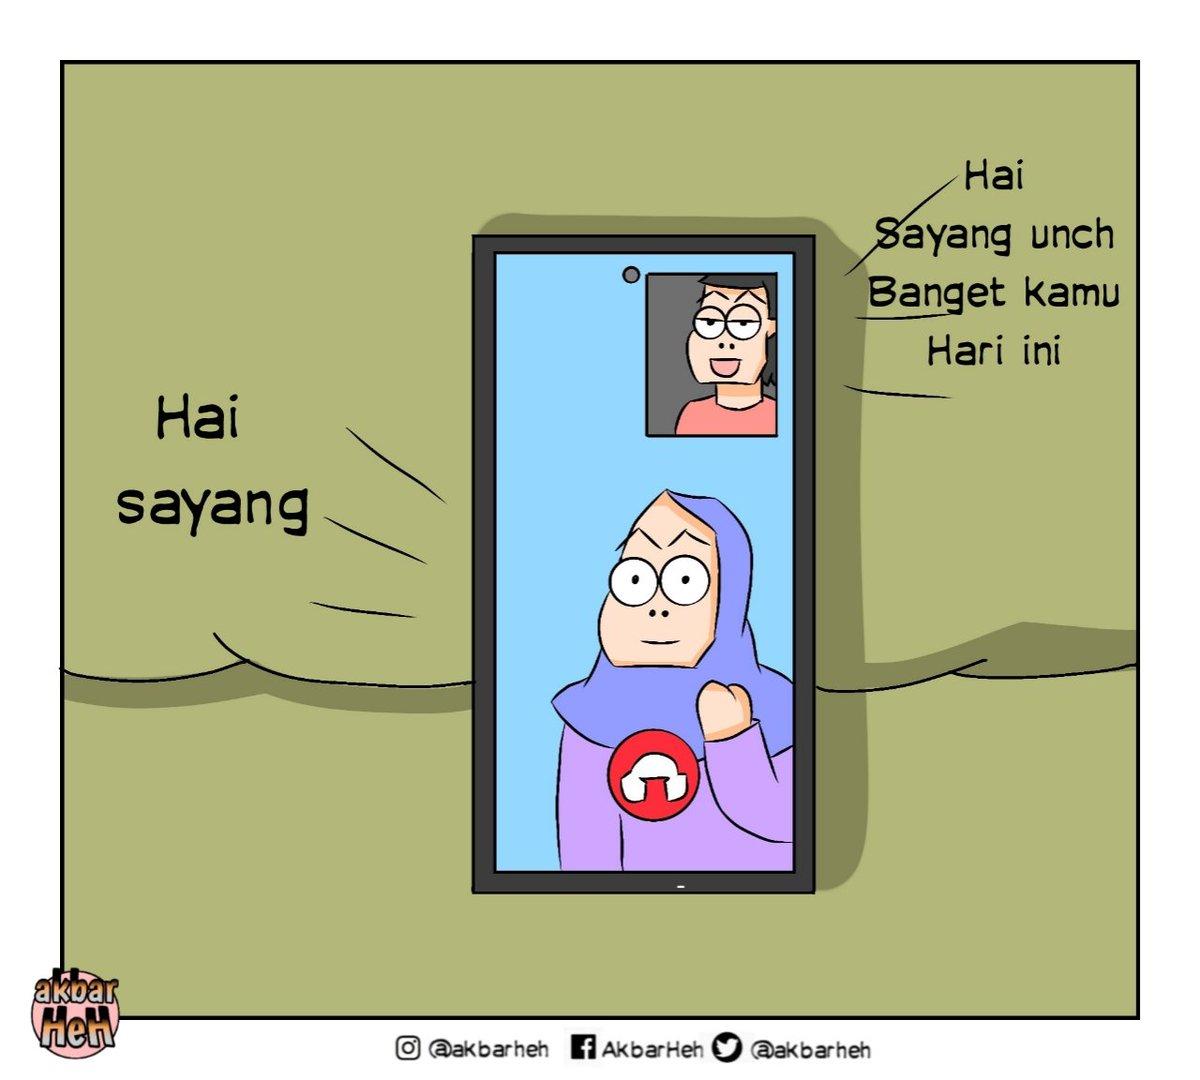 Potret pakboy .  Jangan lupa follow @akbarheh . . . #komikinaja #komikindo #komikindonesia #idntoon #komiklucu #komikharian #komikngakak #ngakakkocak #komikviral  #viral #indonesia #komikharian_ #komiksederhana #komikhot #siang  #komikzero #komikpolisipic.twitter.com/JS7hkZDQHC